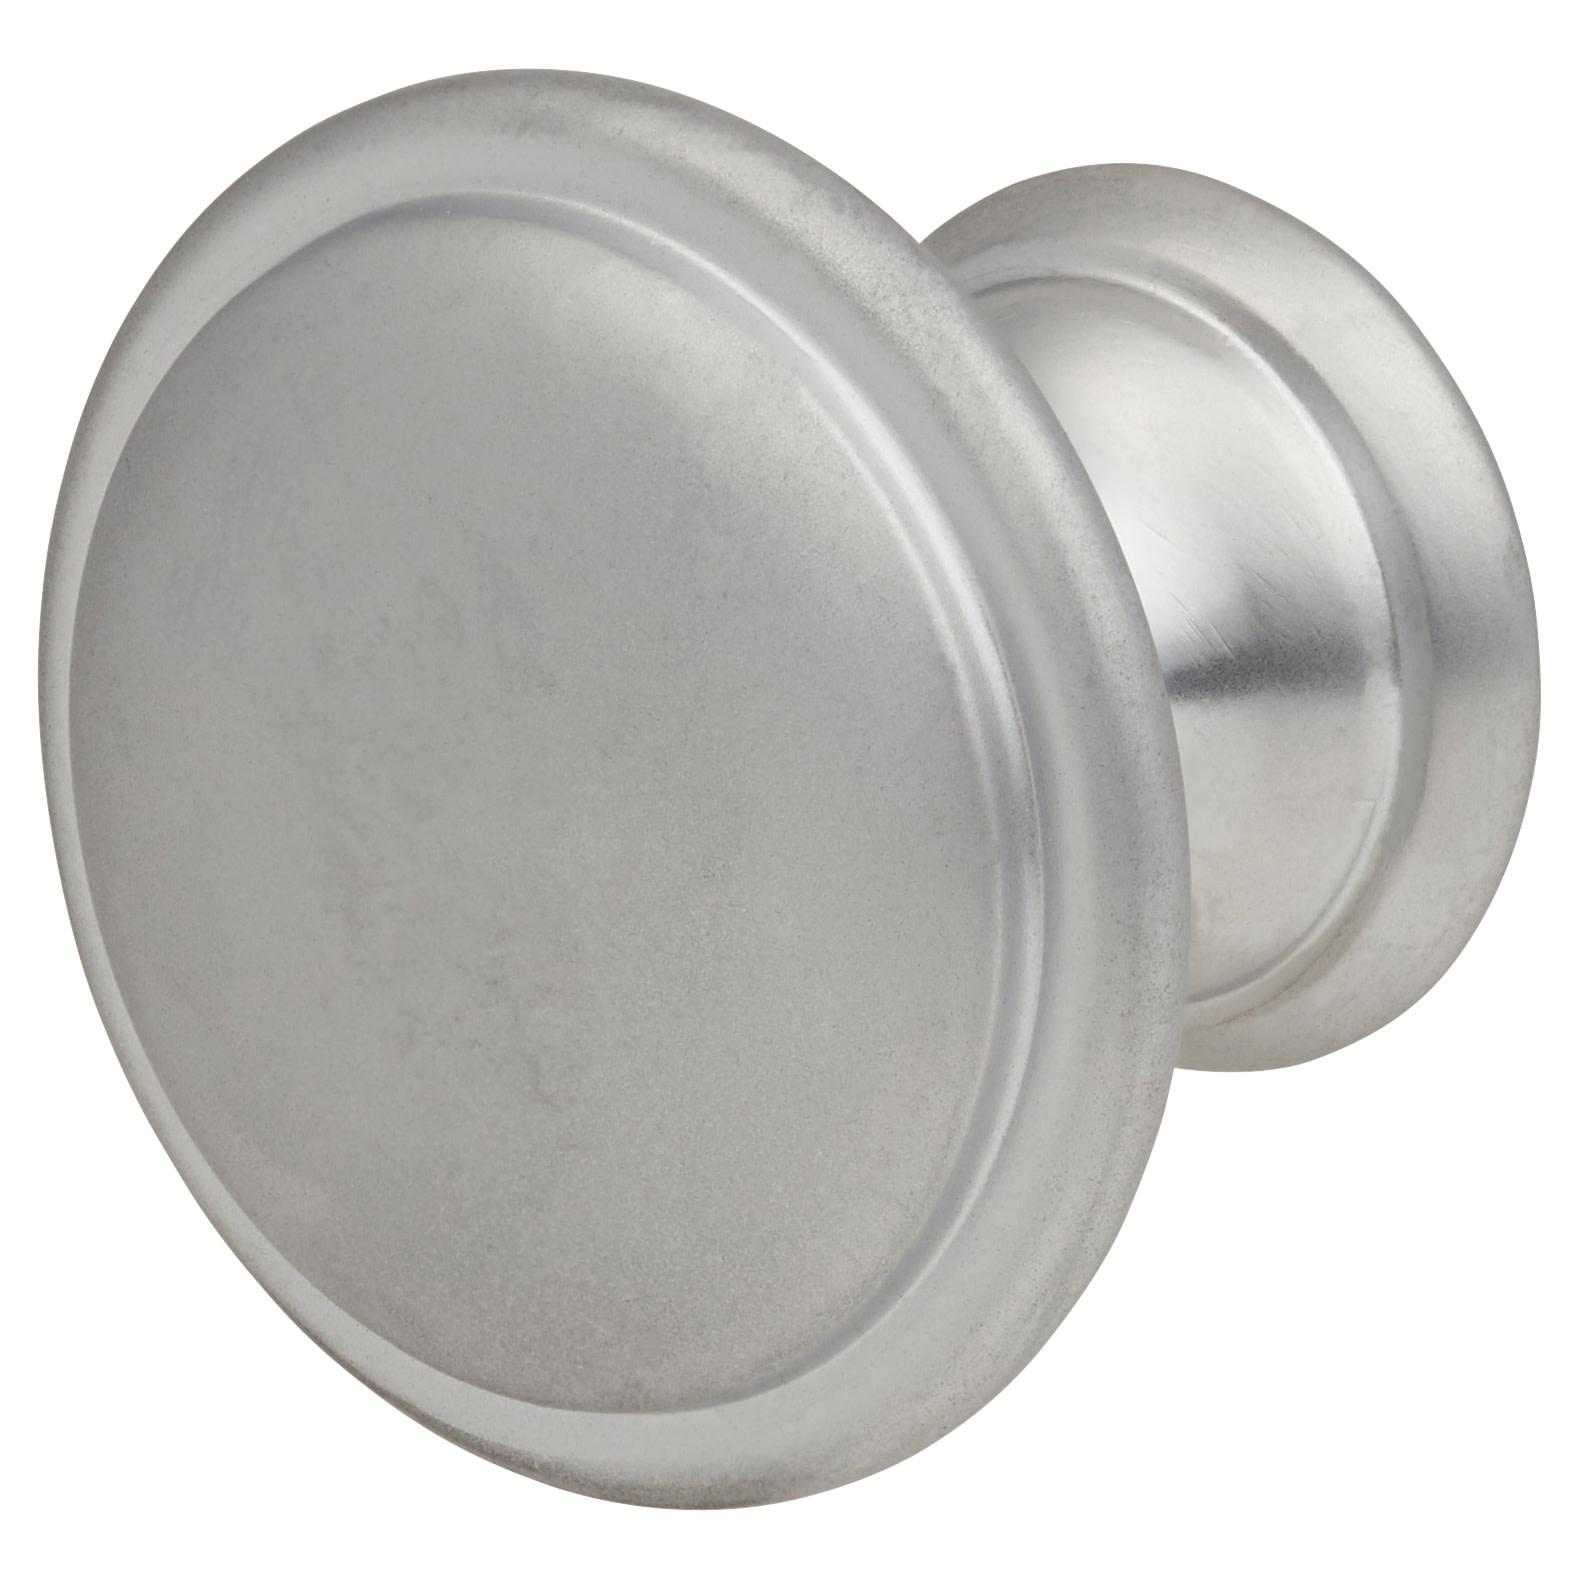 Touchpoint Rim Cabinet Knob - 30mm - Matt Chrome)